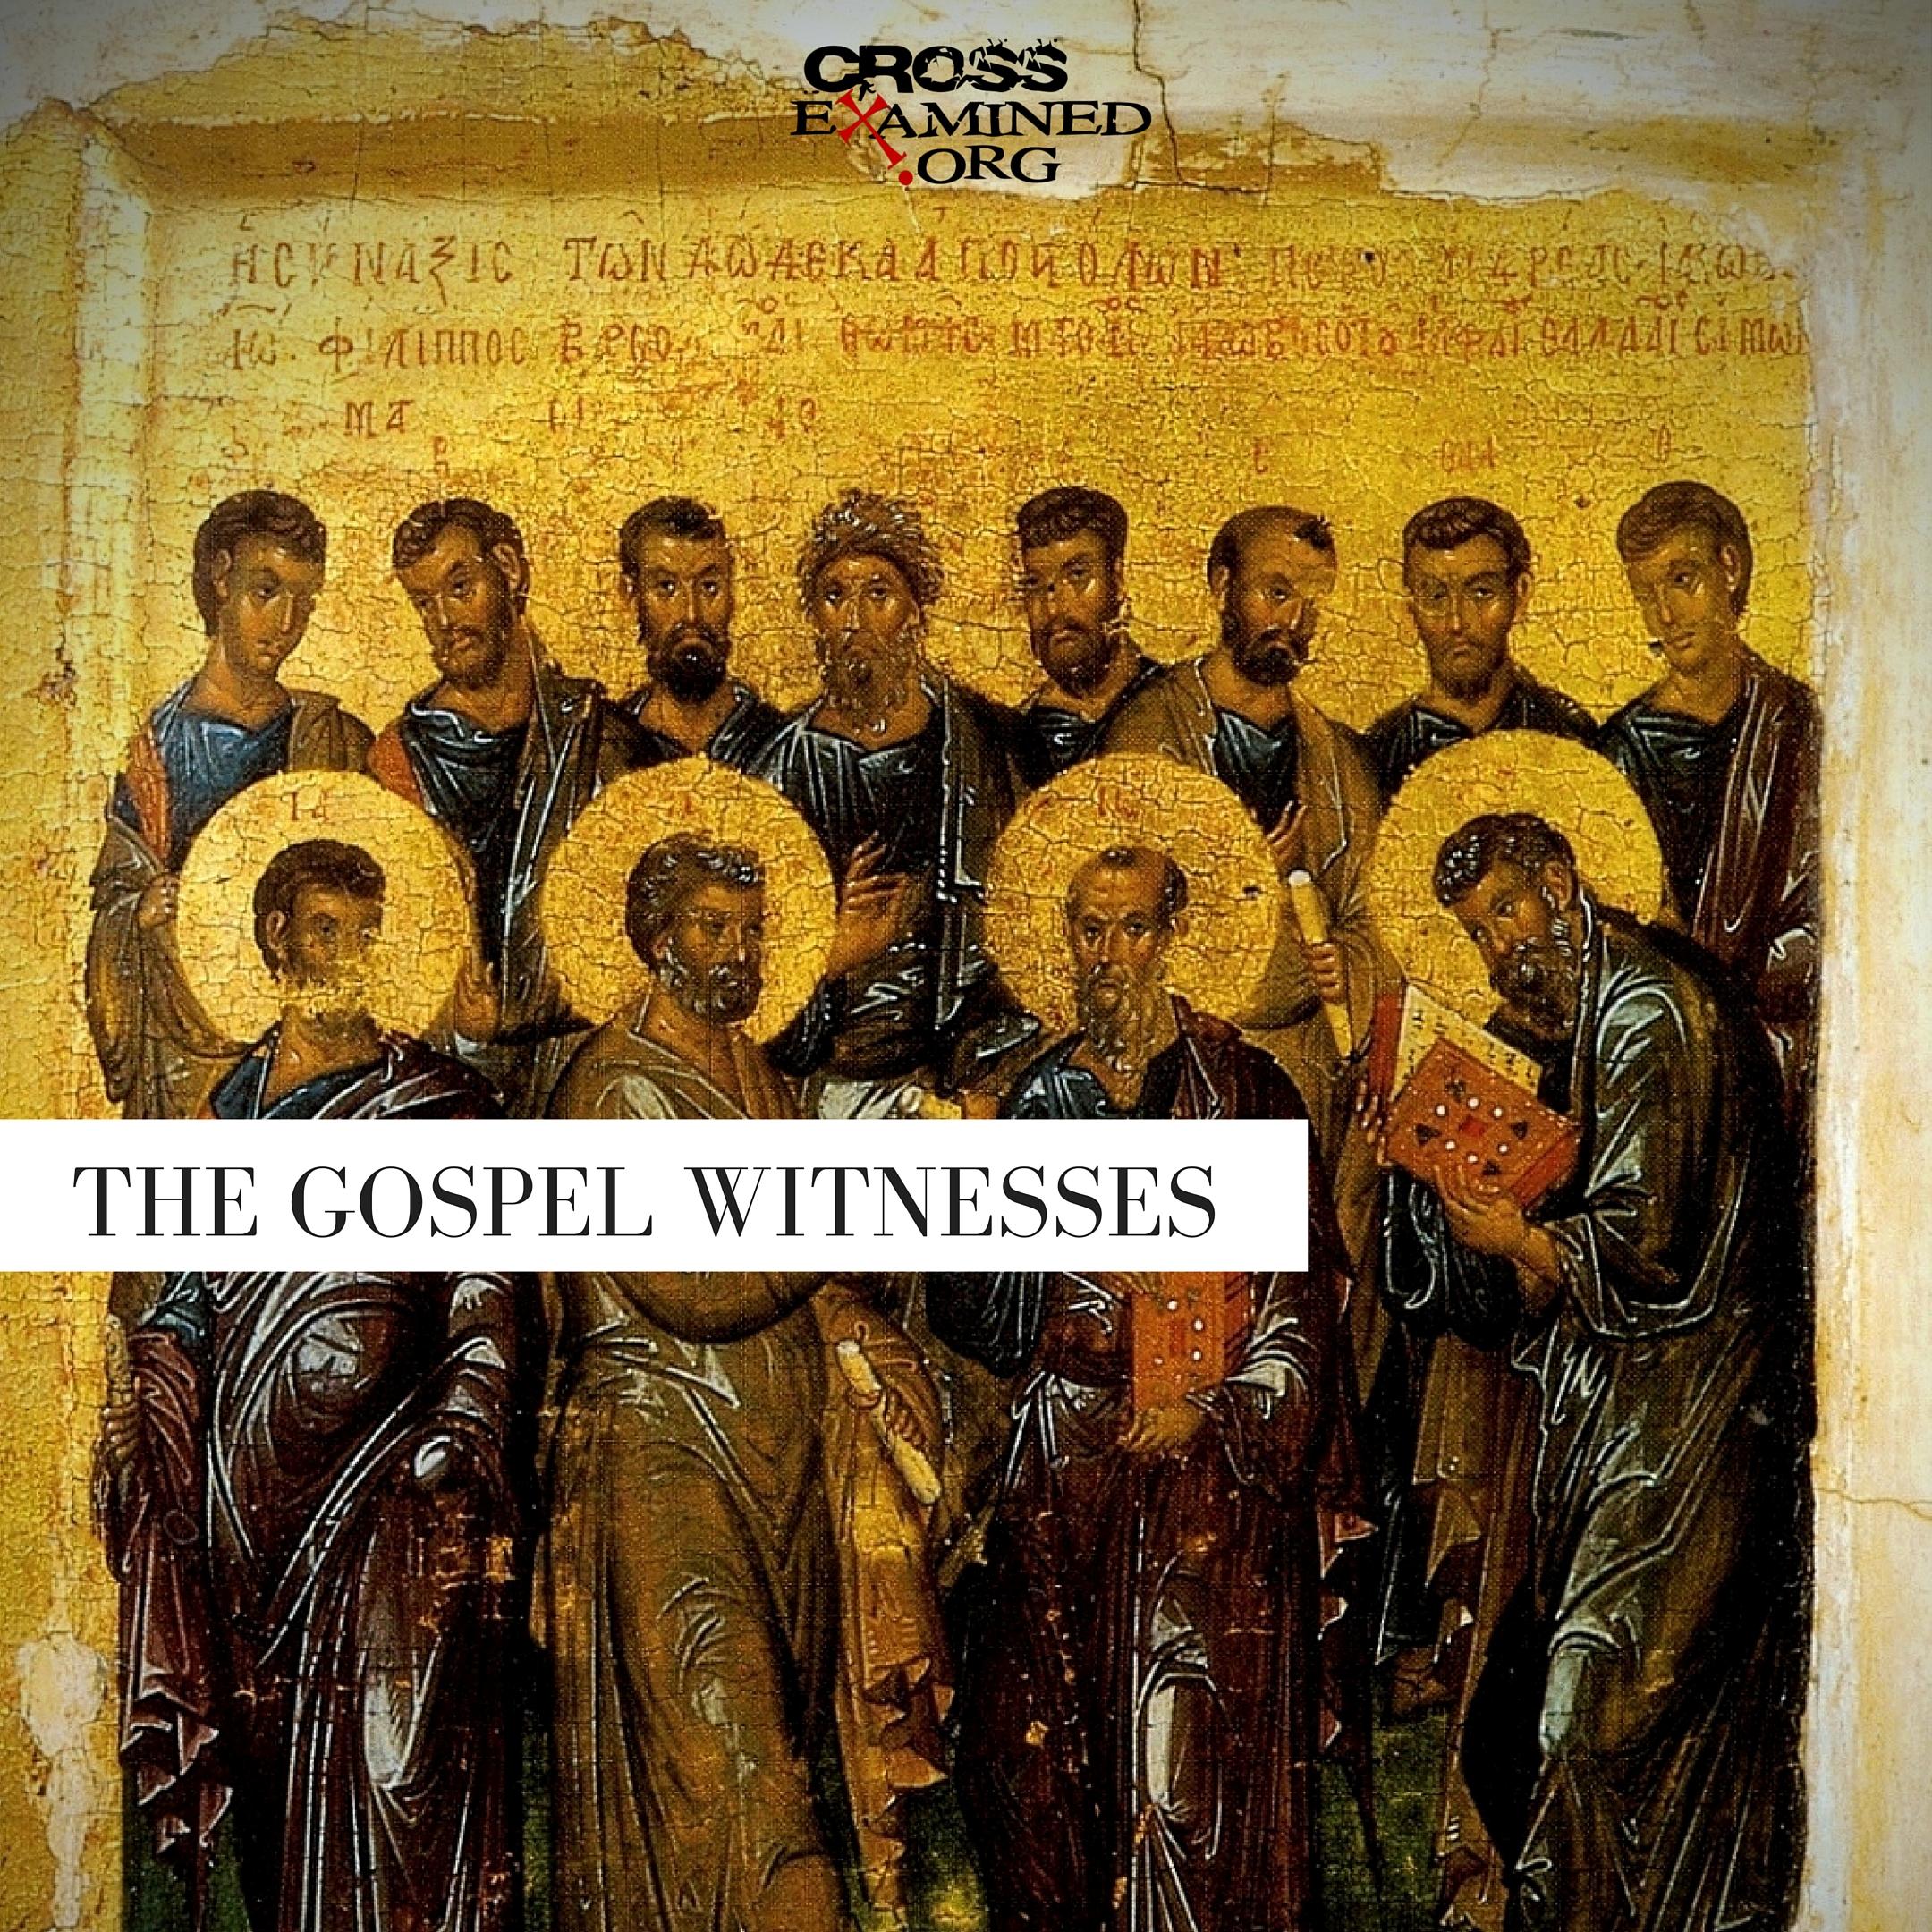 Examining Jesus by the Historical Method (Part 7: Eyewitness Testimony–The Gospel Witnesses)